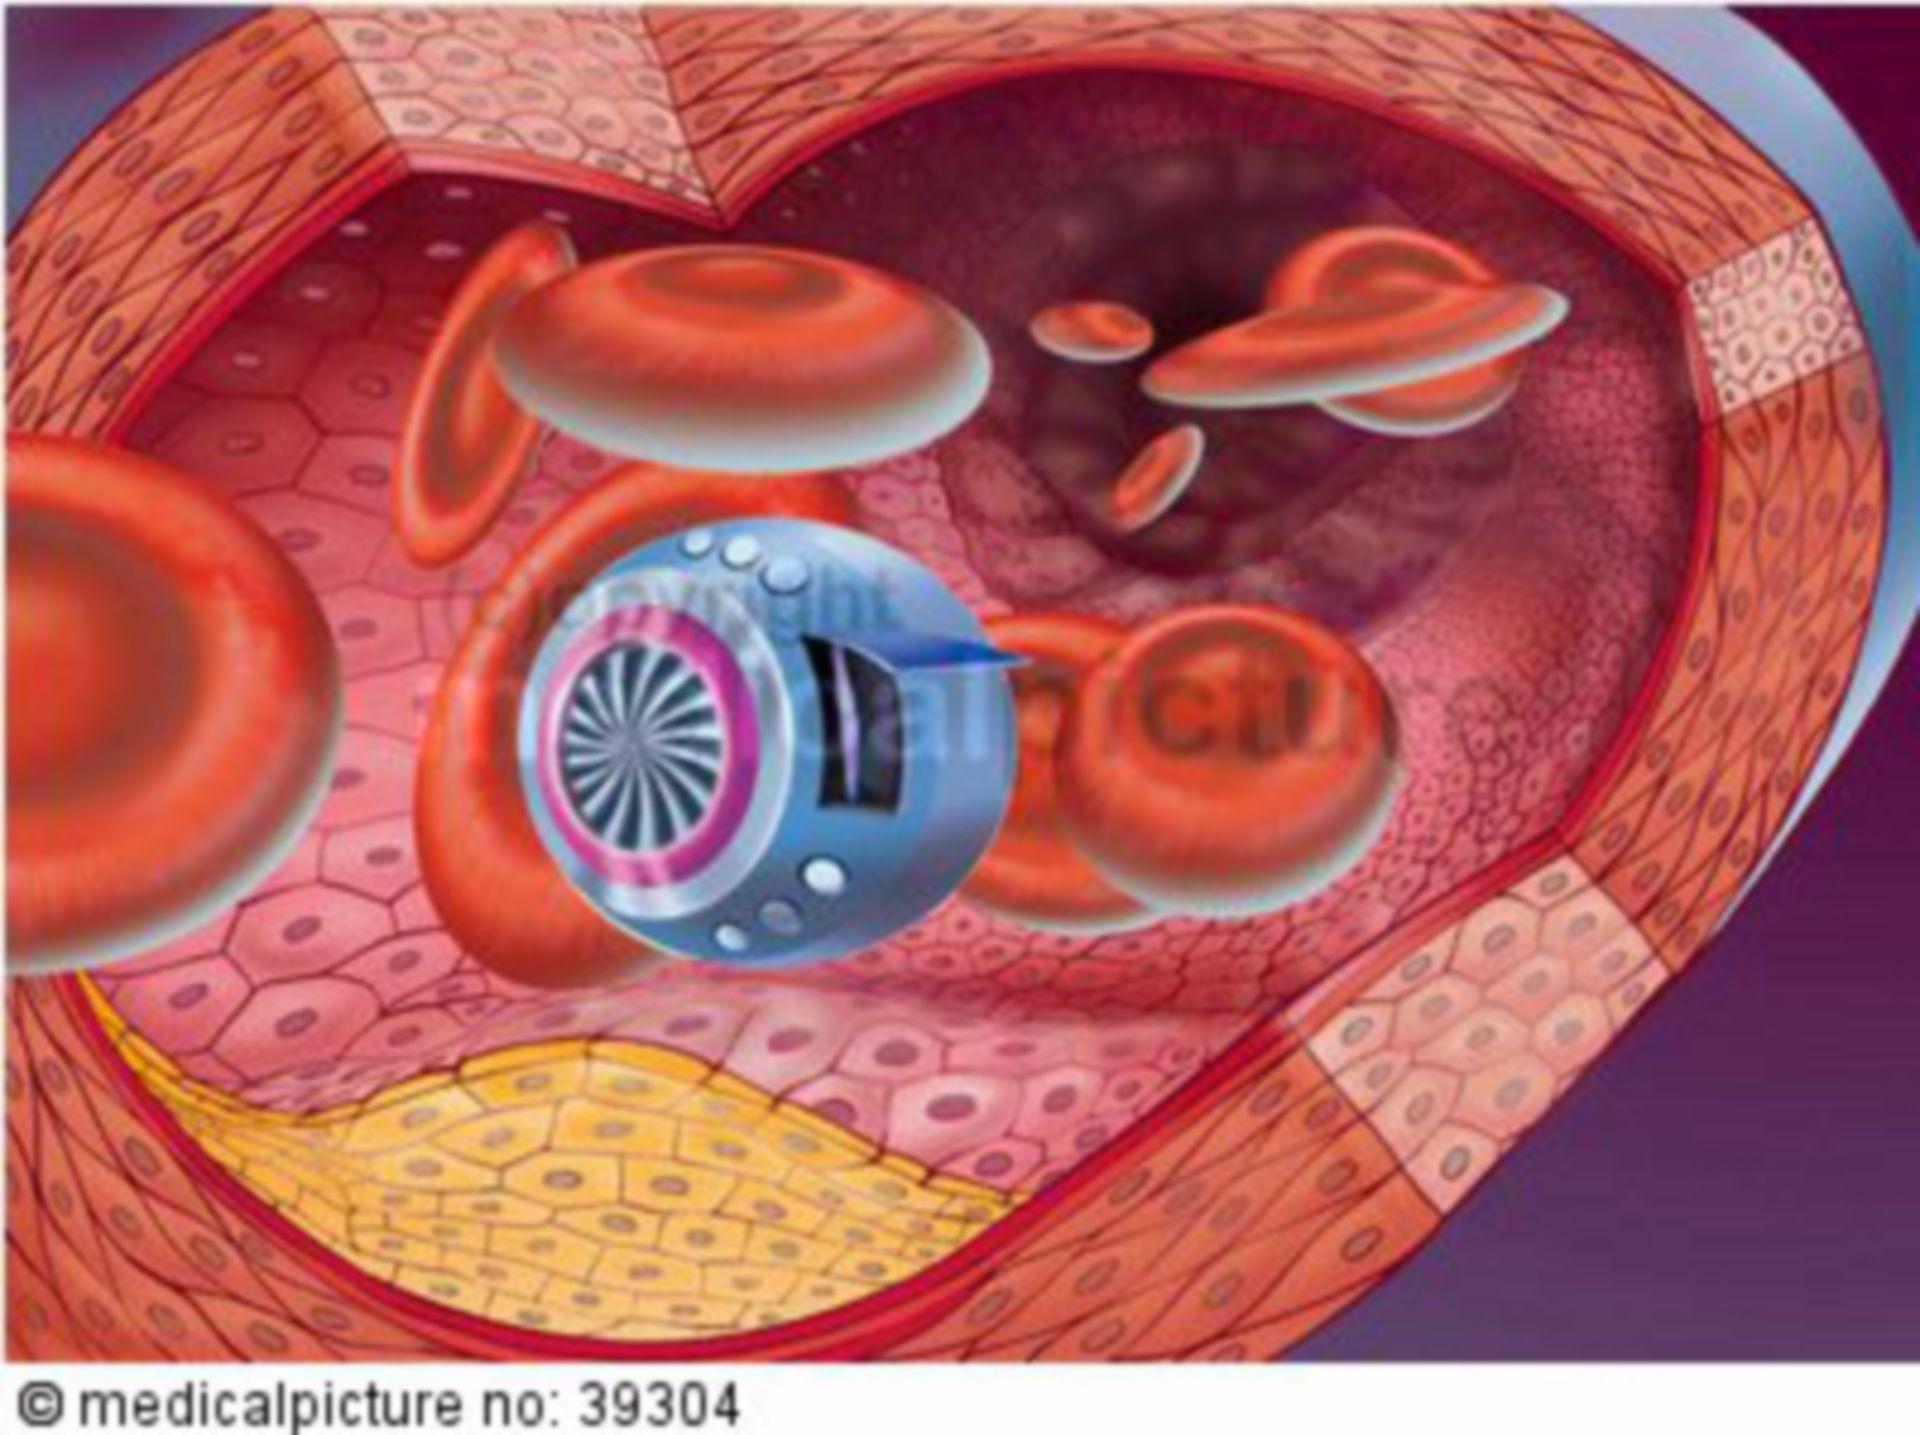 Nanoroboter der Arterienreinigung, Nanorobot